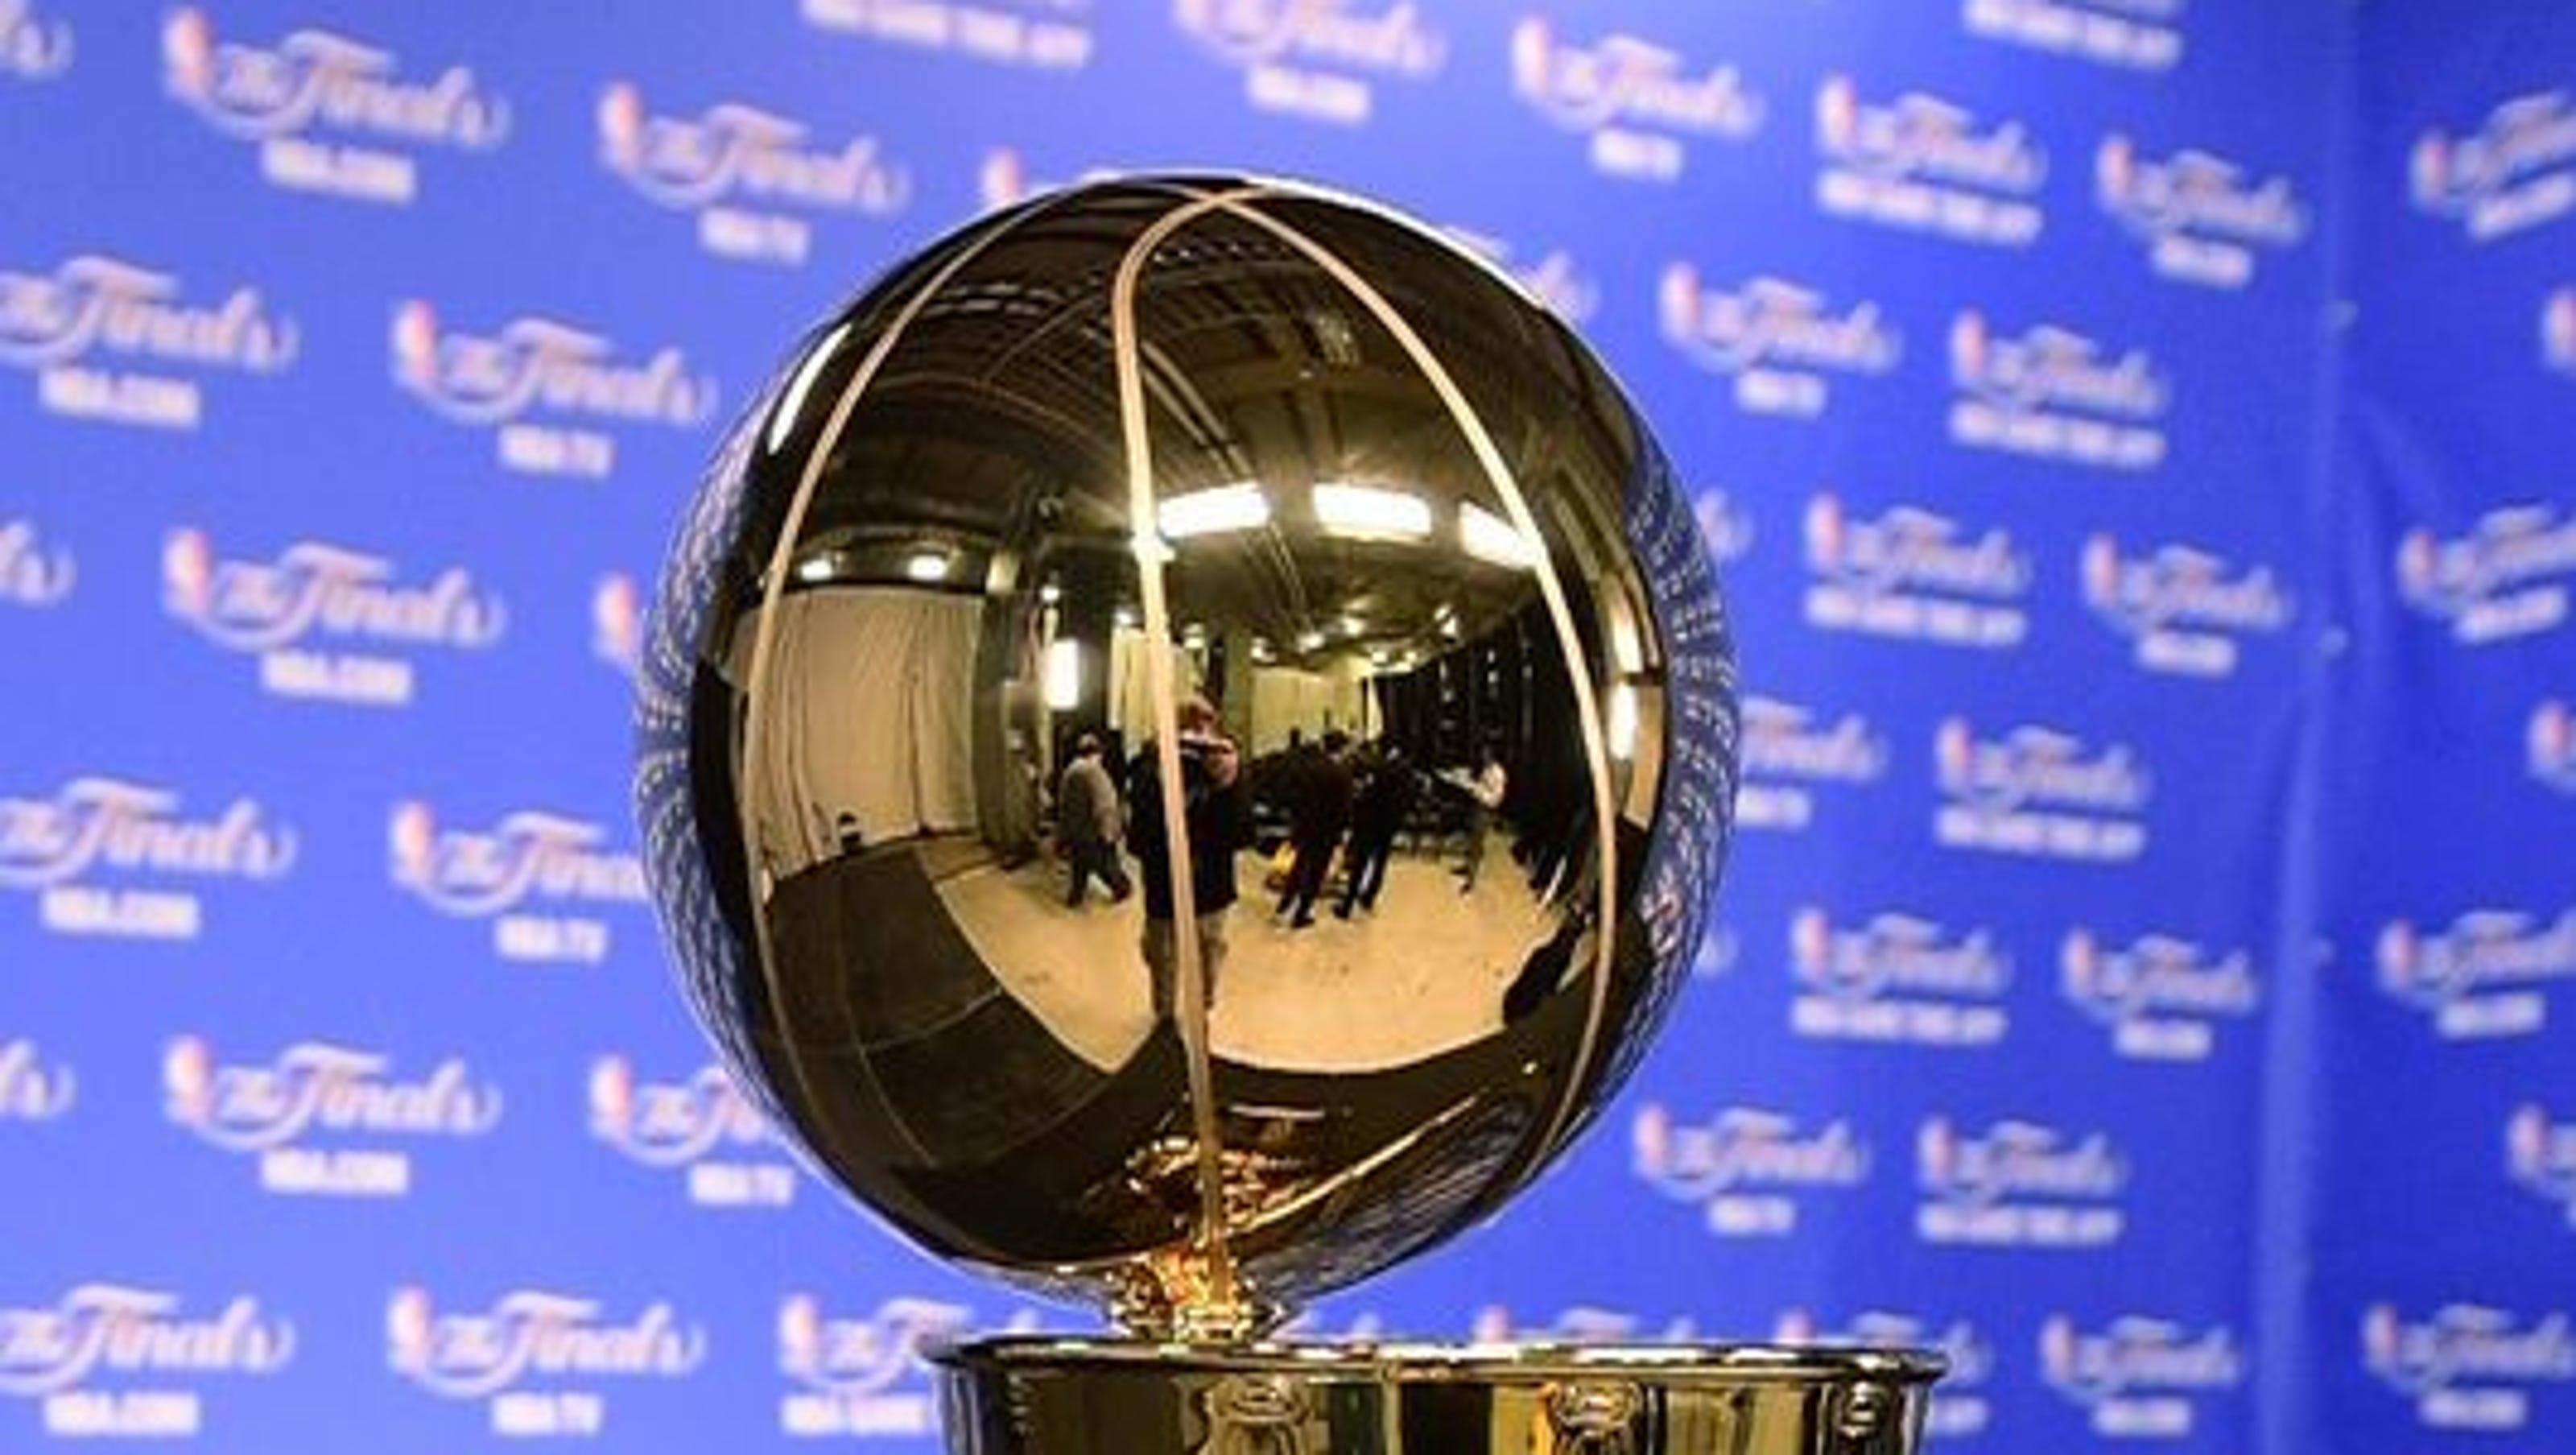 NBA Finals key numbers, expert picks: Warriors the clear favorite vs. Cavs?